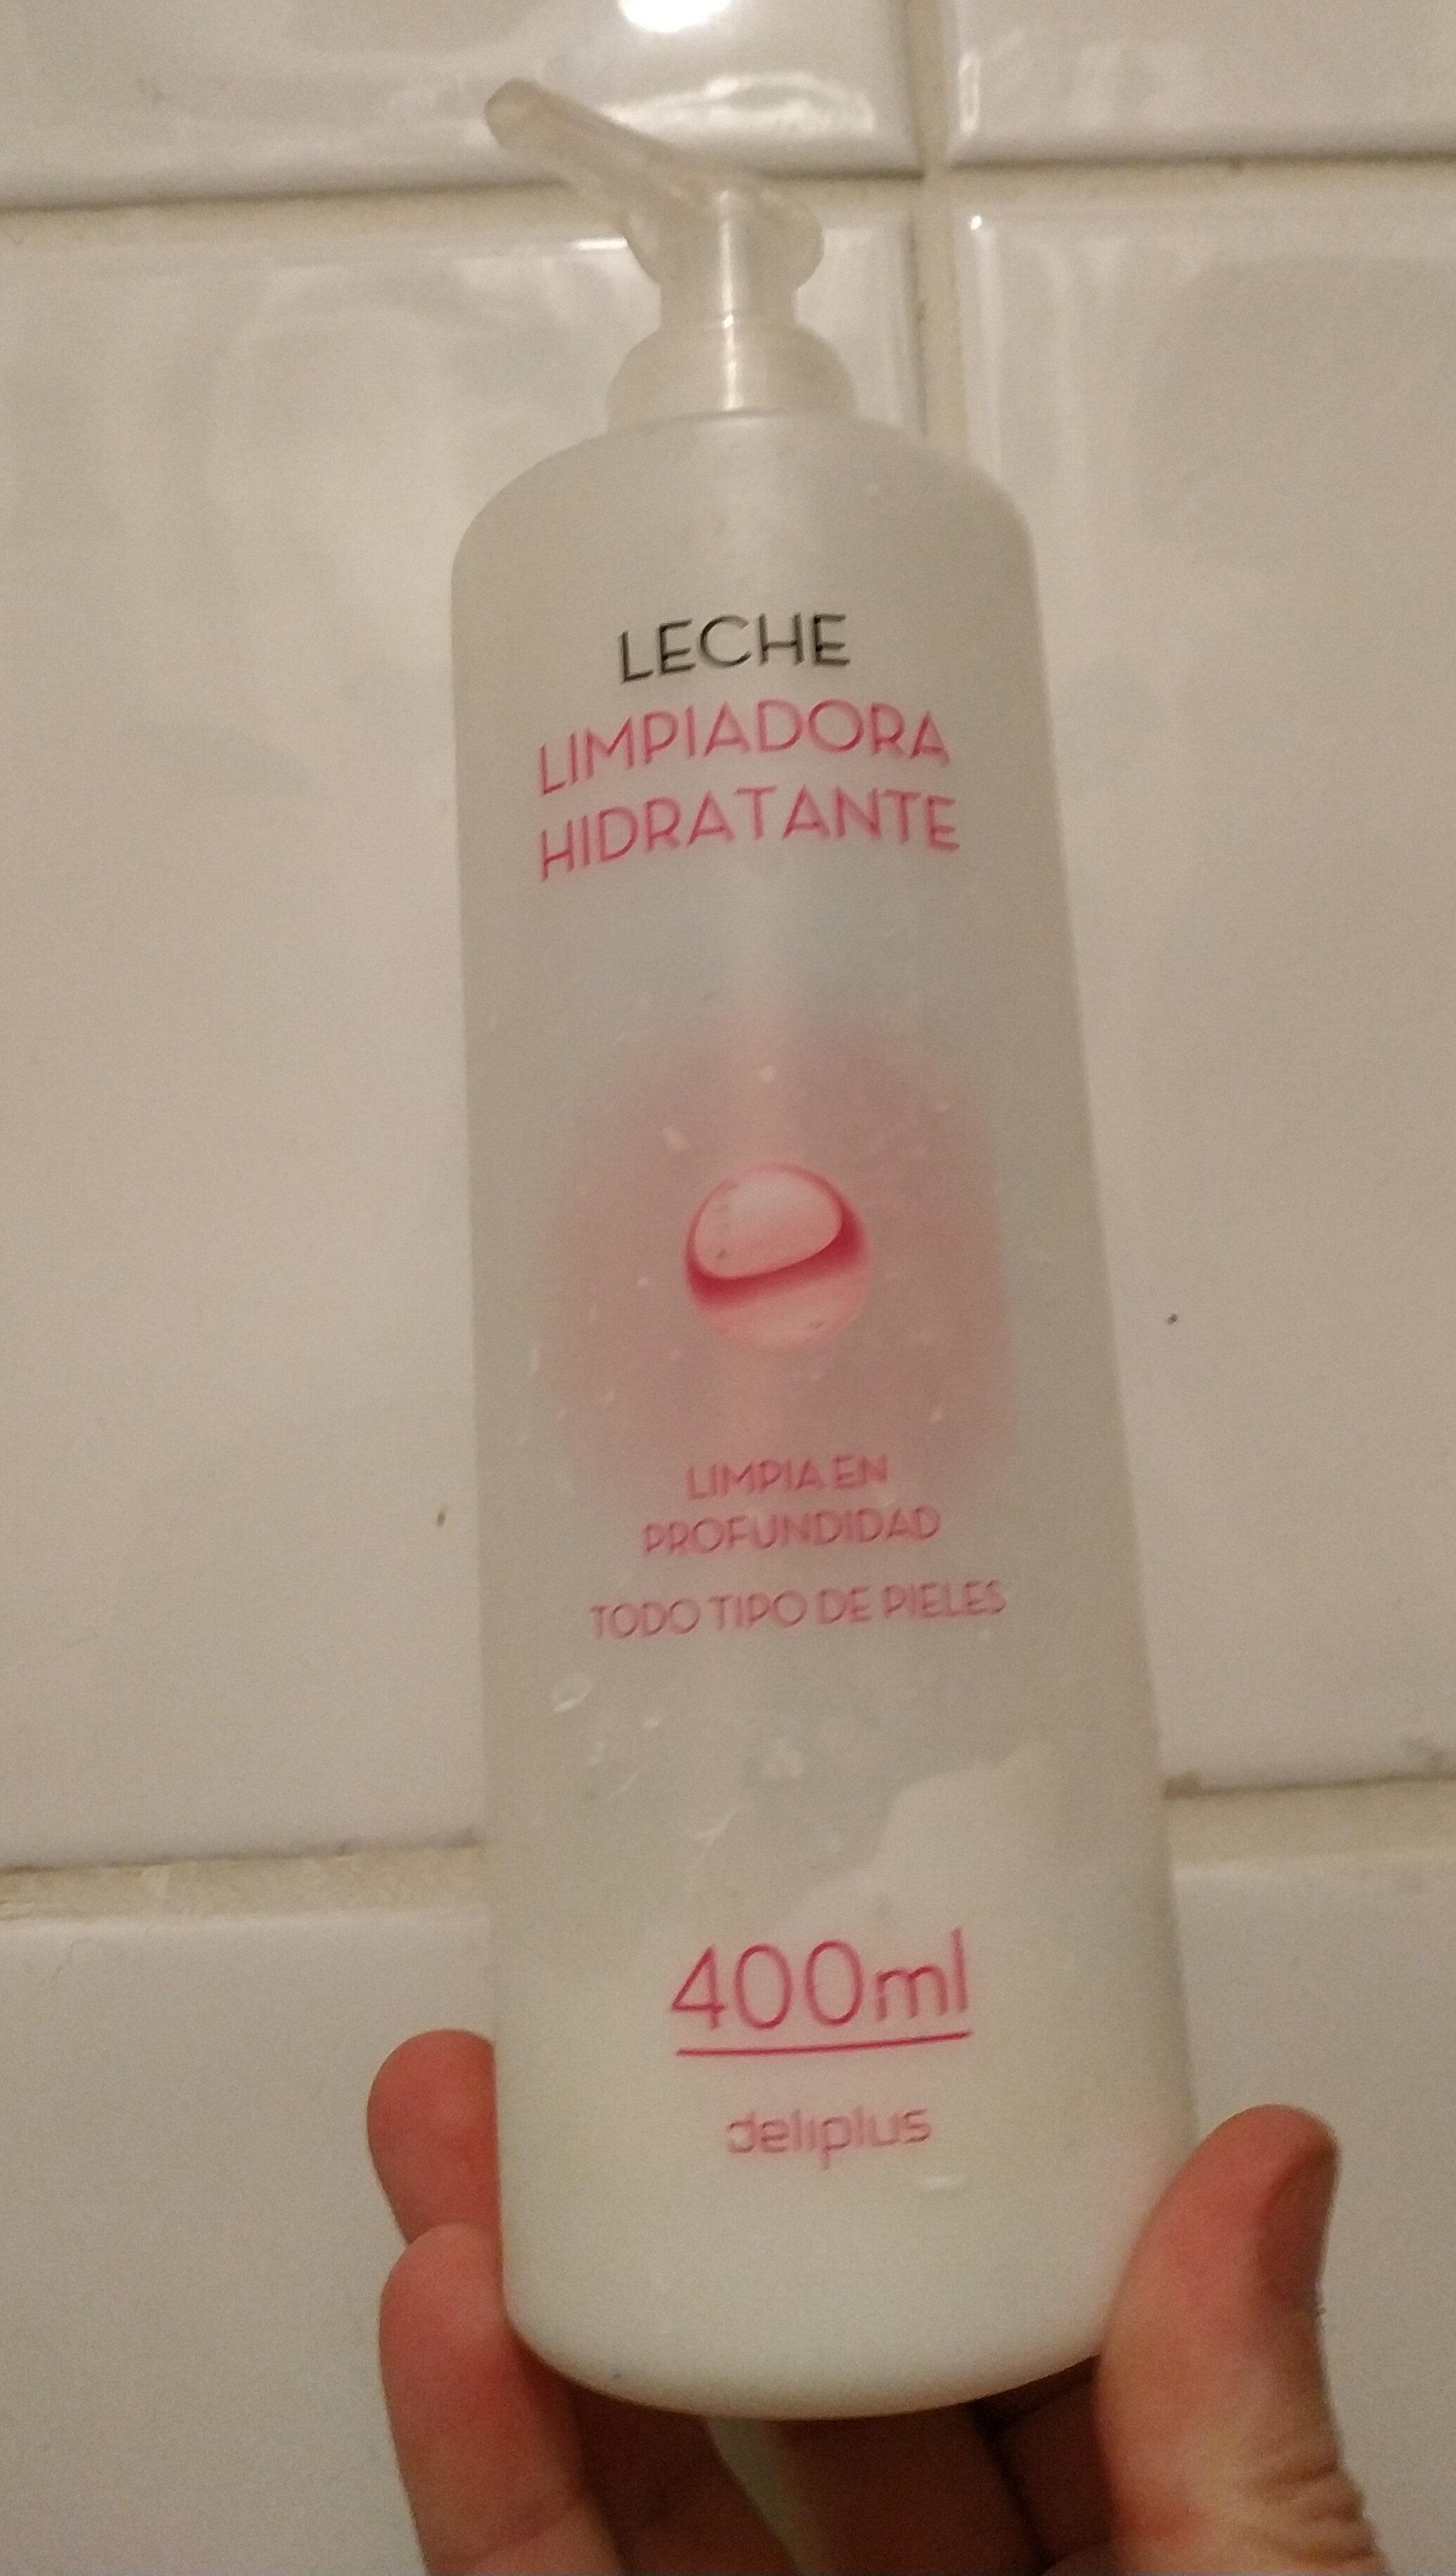 LECHE LIMPIADORA HIDRATANTE - Product - es